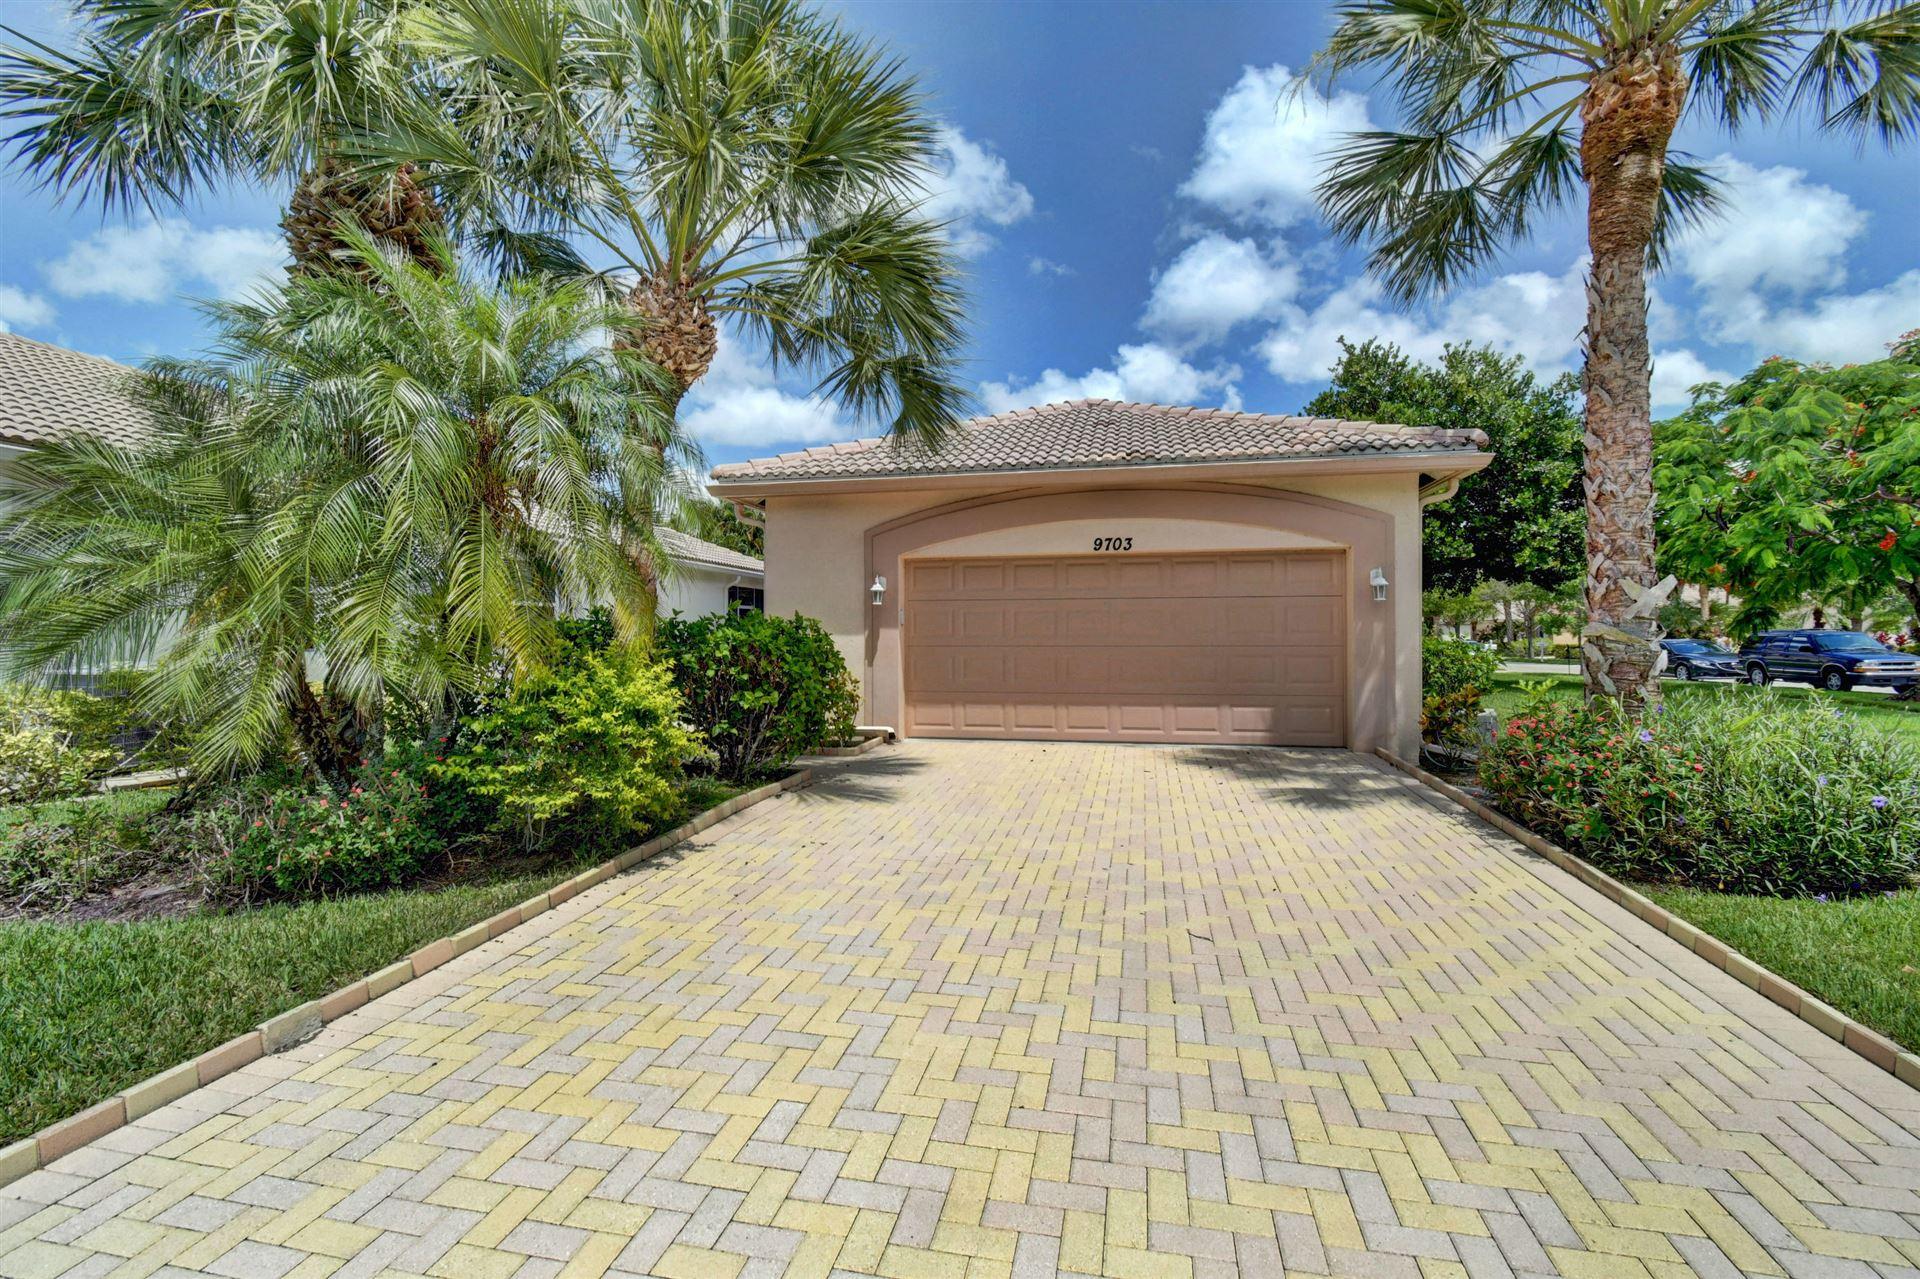 9703 Sandpiper Lane, West Palm Beach, FL 33411 - #: RX-10644506